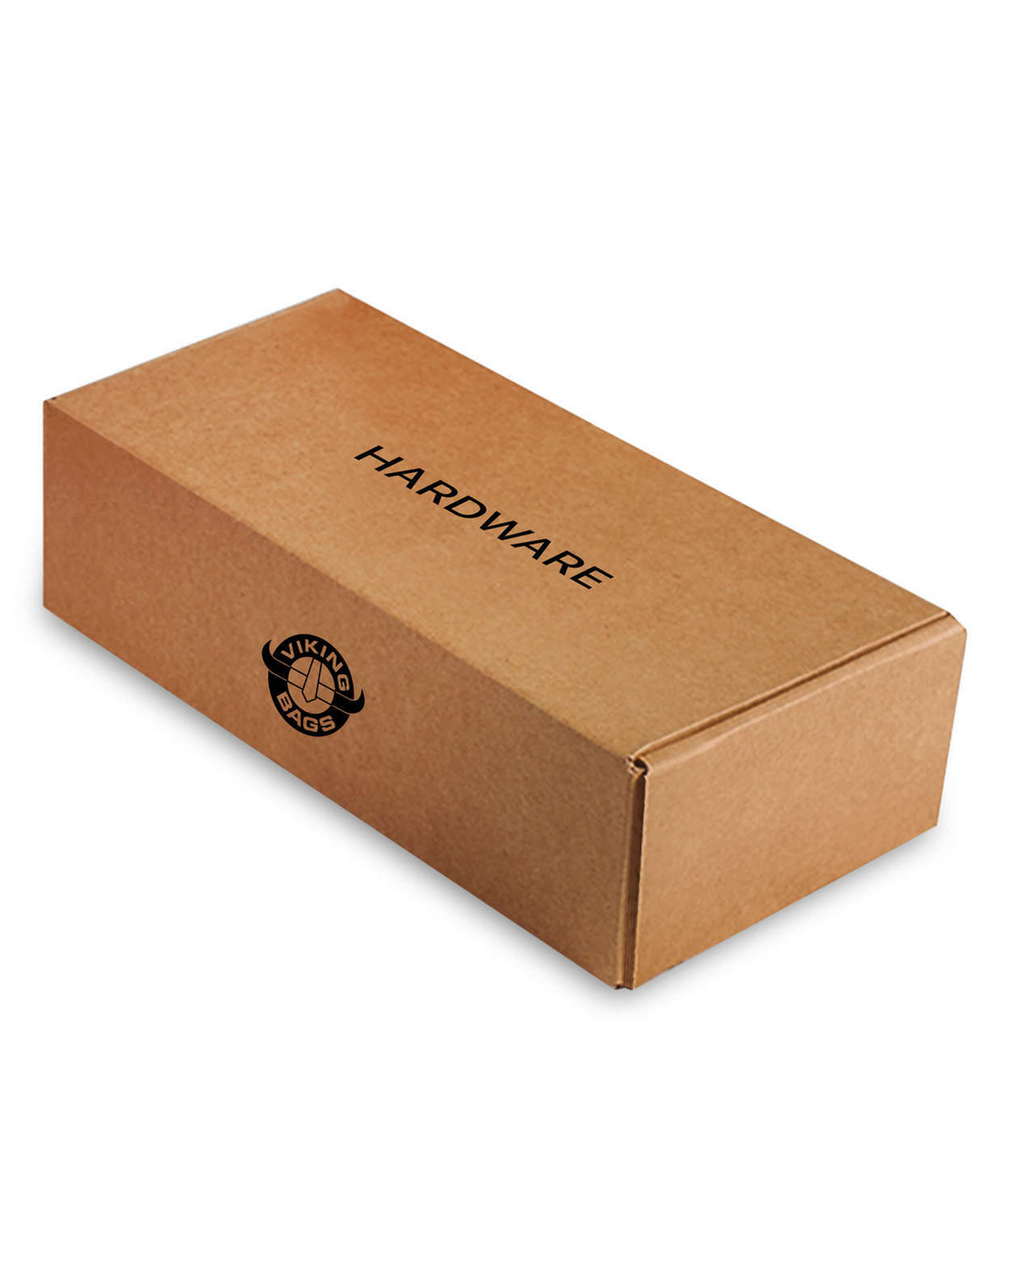 Triumph Thunderbird Charger Single Strap Studded Large Motorcycle Saddlebags Box